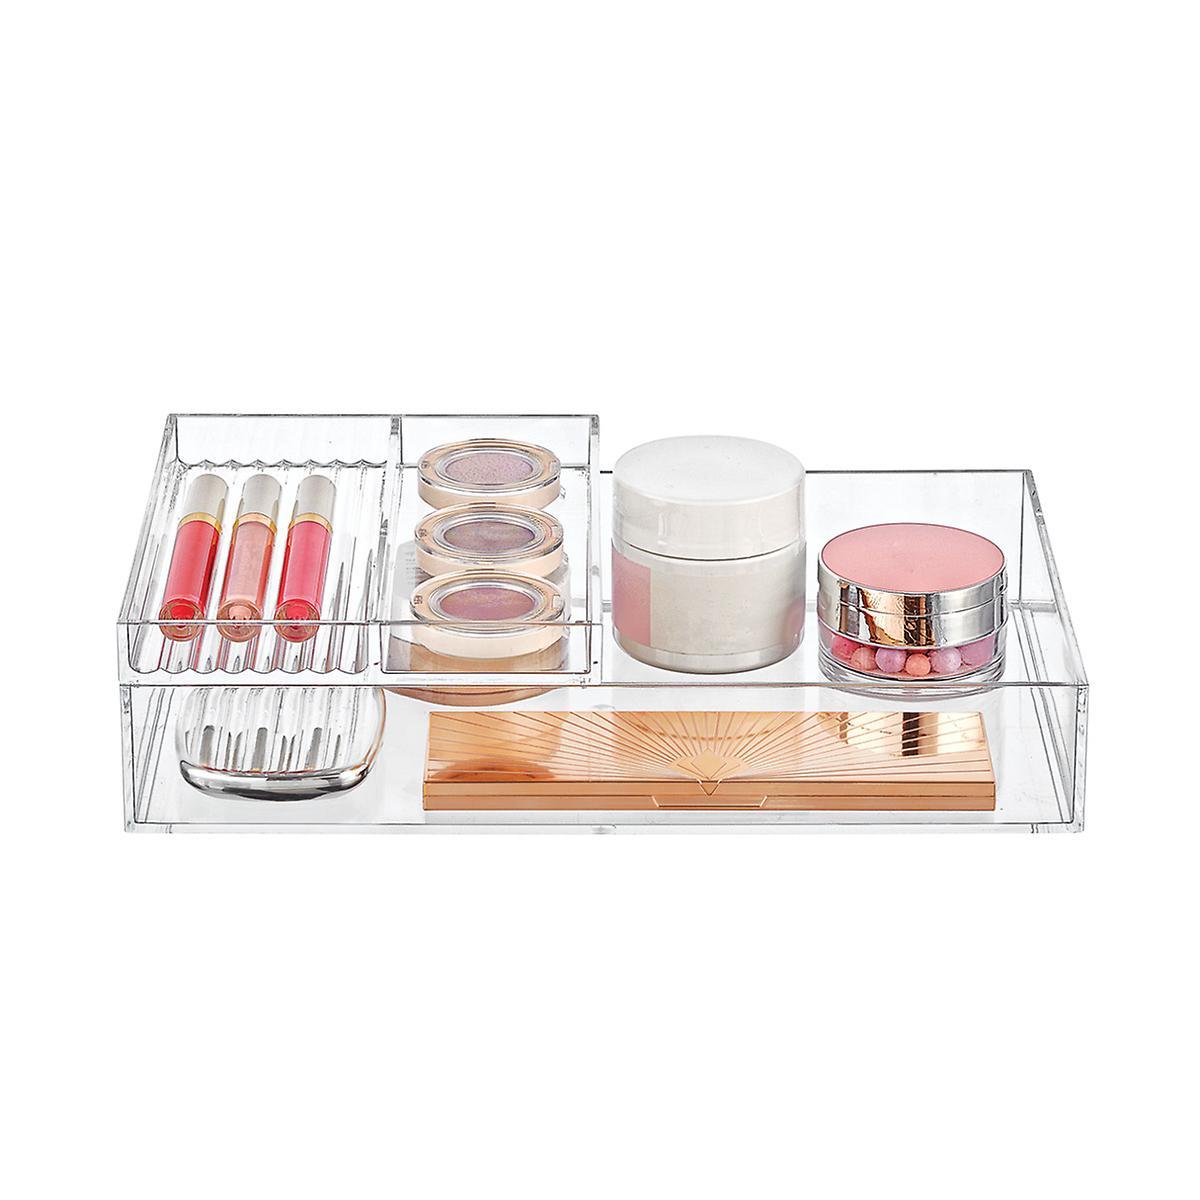 Clear Acrylic Trays Makeup Storage Starter Kit